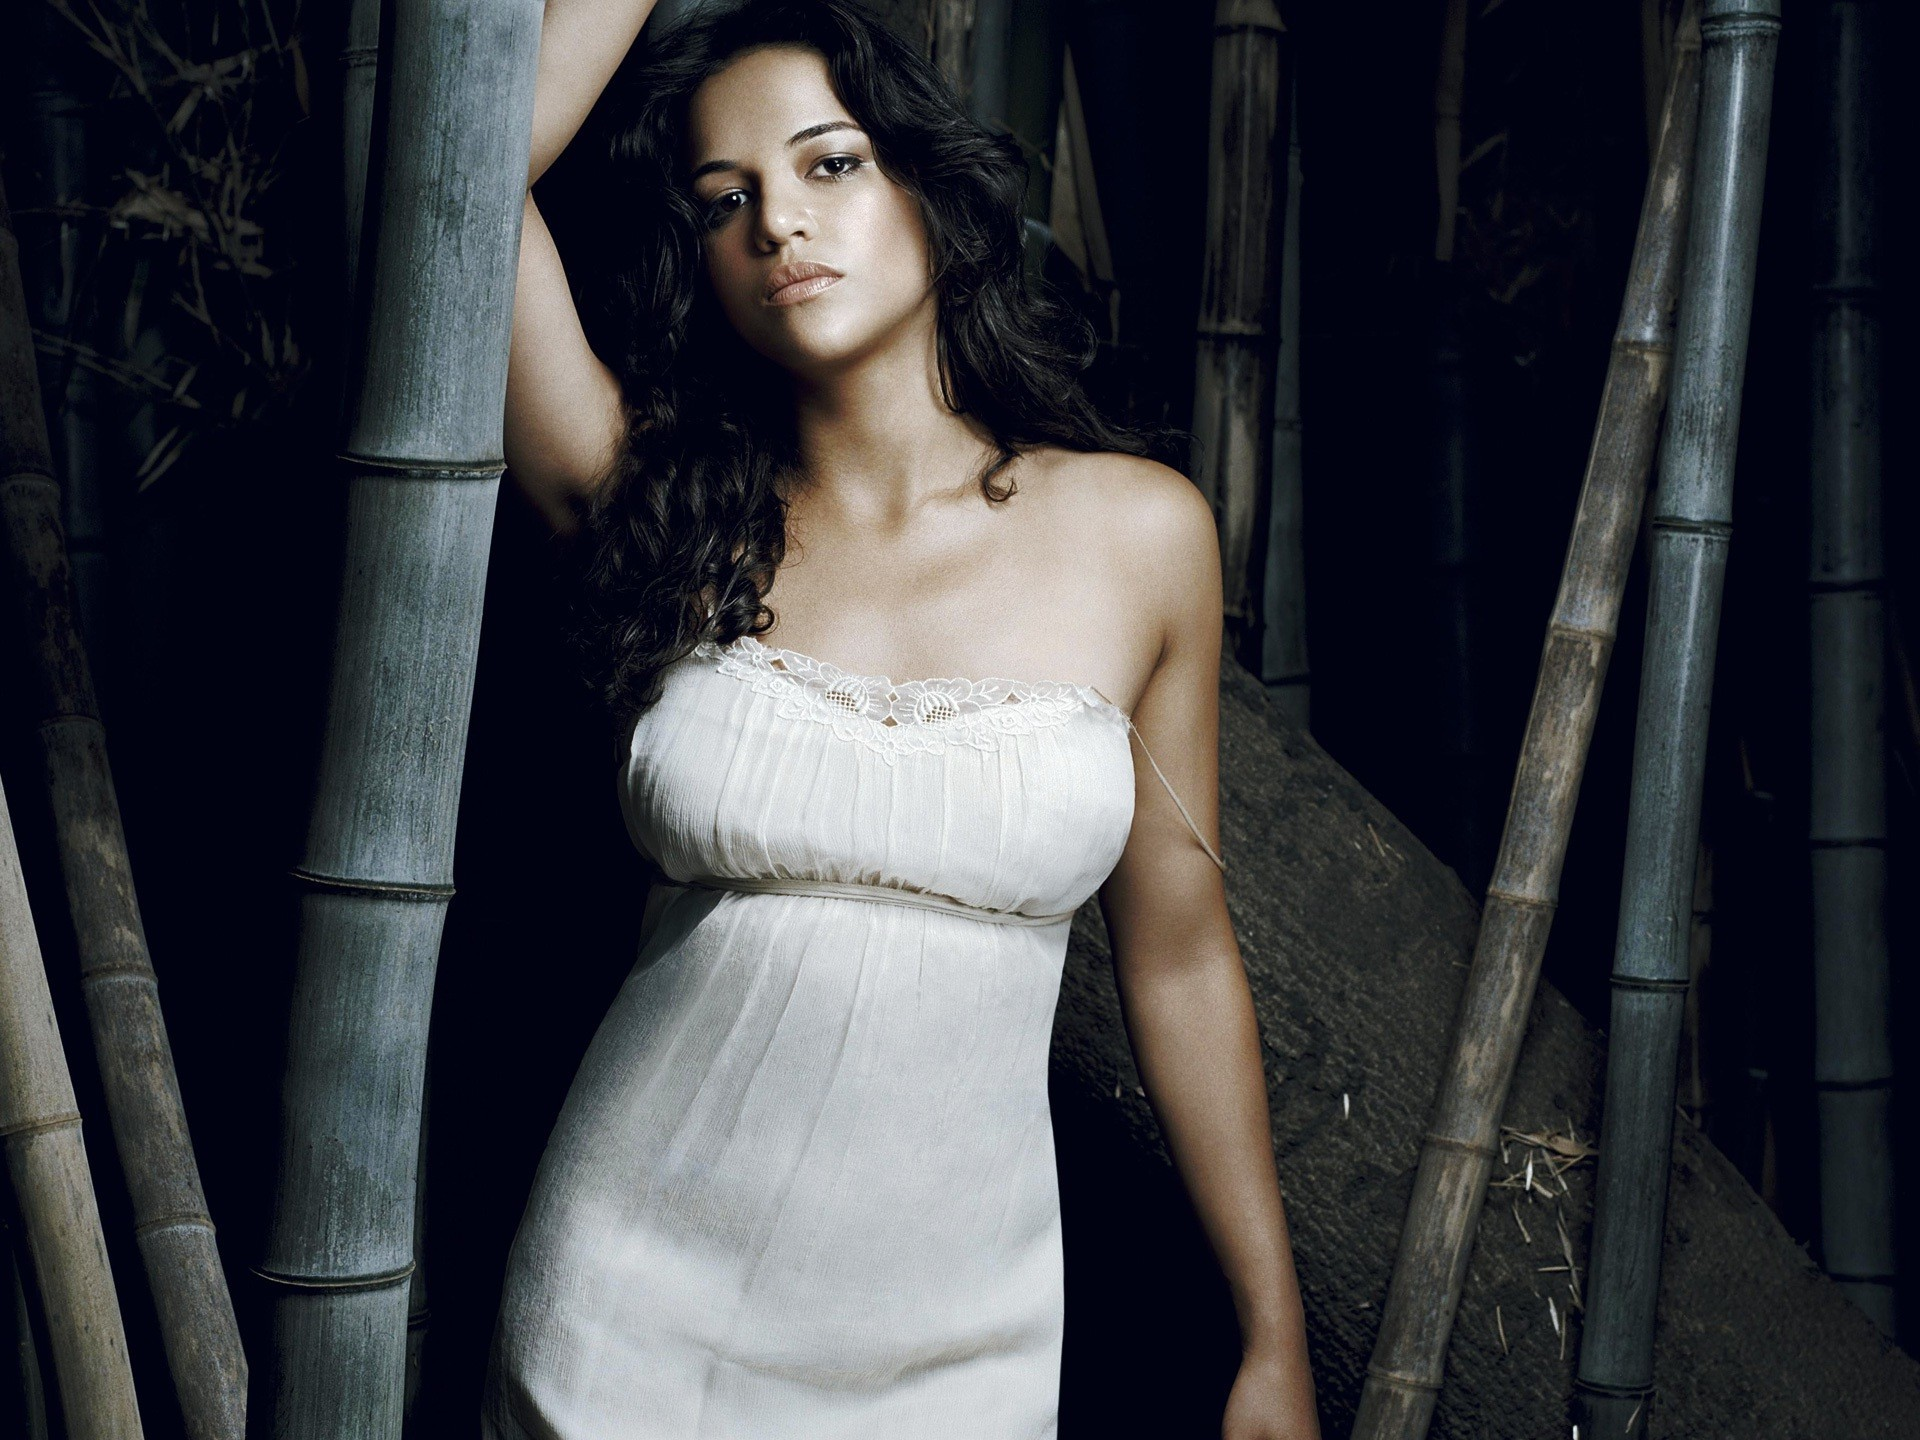 Michelle Rodriguez 2014. Michelle Rodriguez Wallpaper HD1